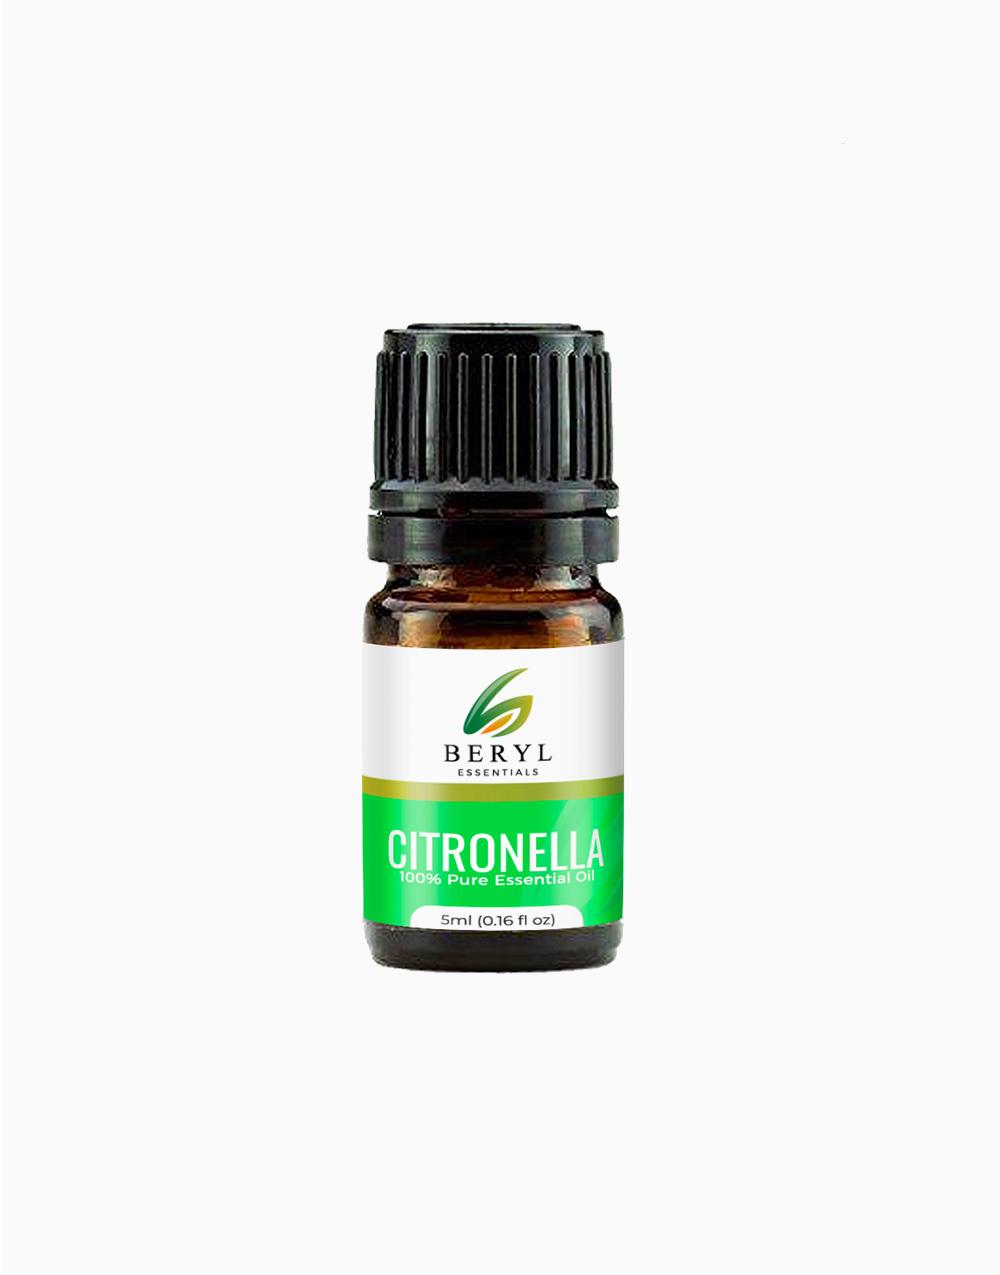 Citronella Essential Oil (5ml) by Beryl Essentials